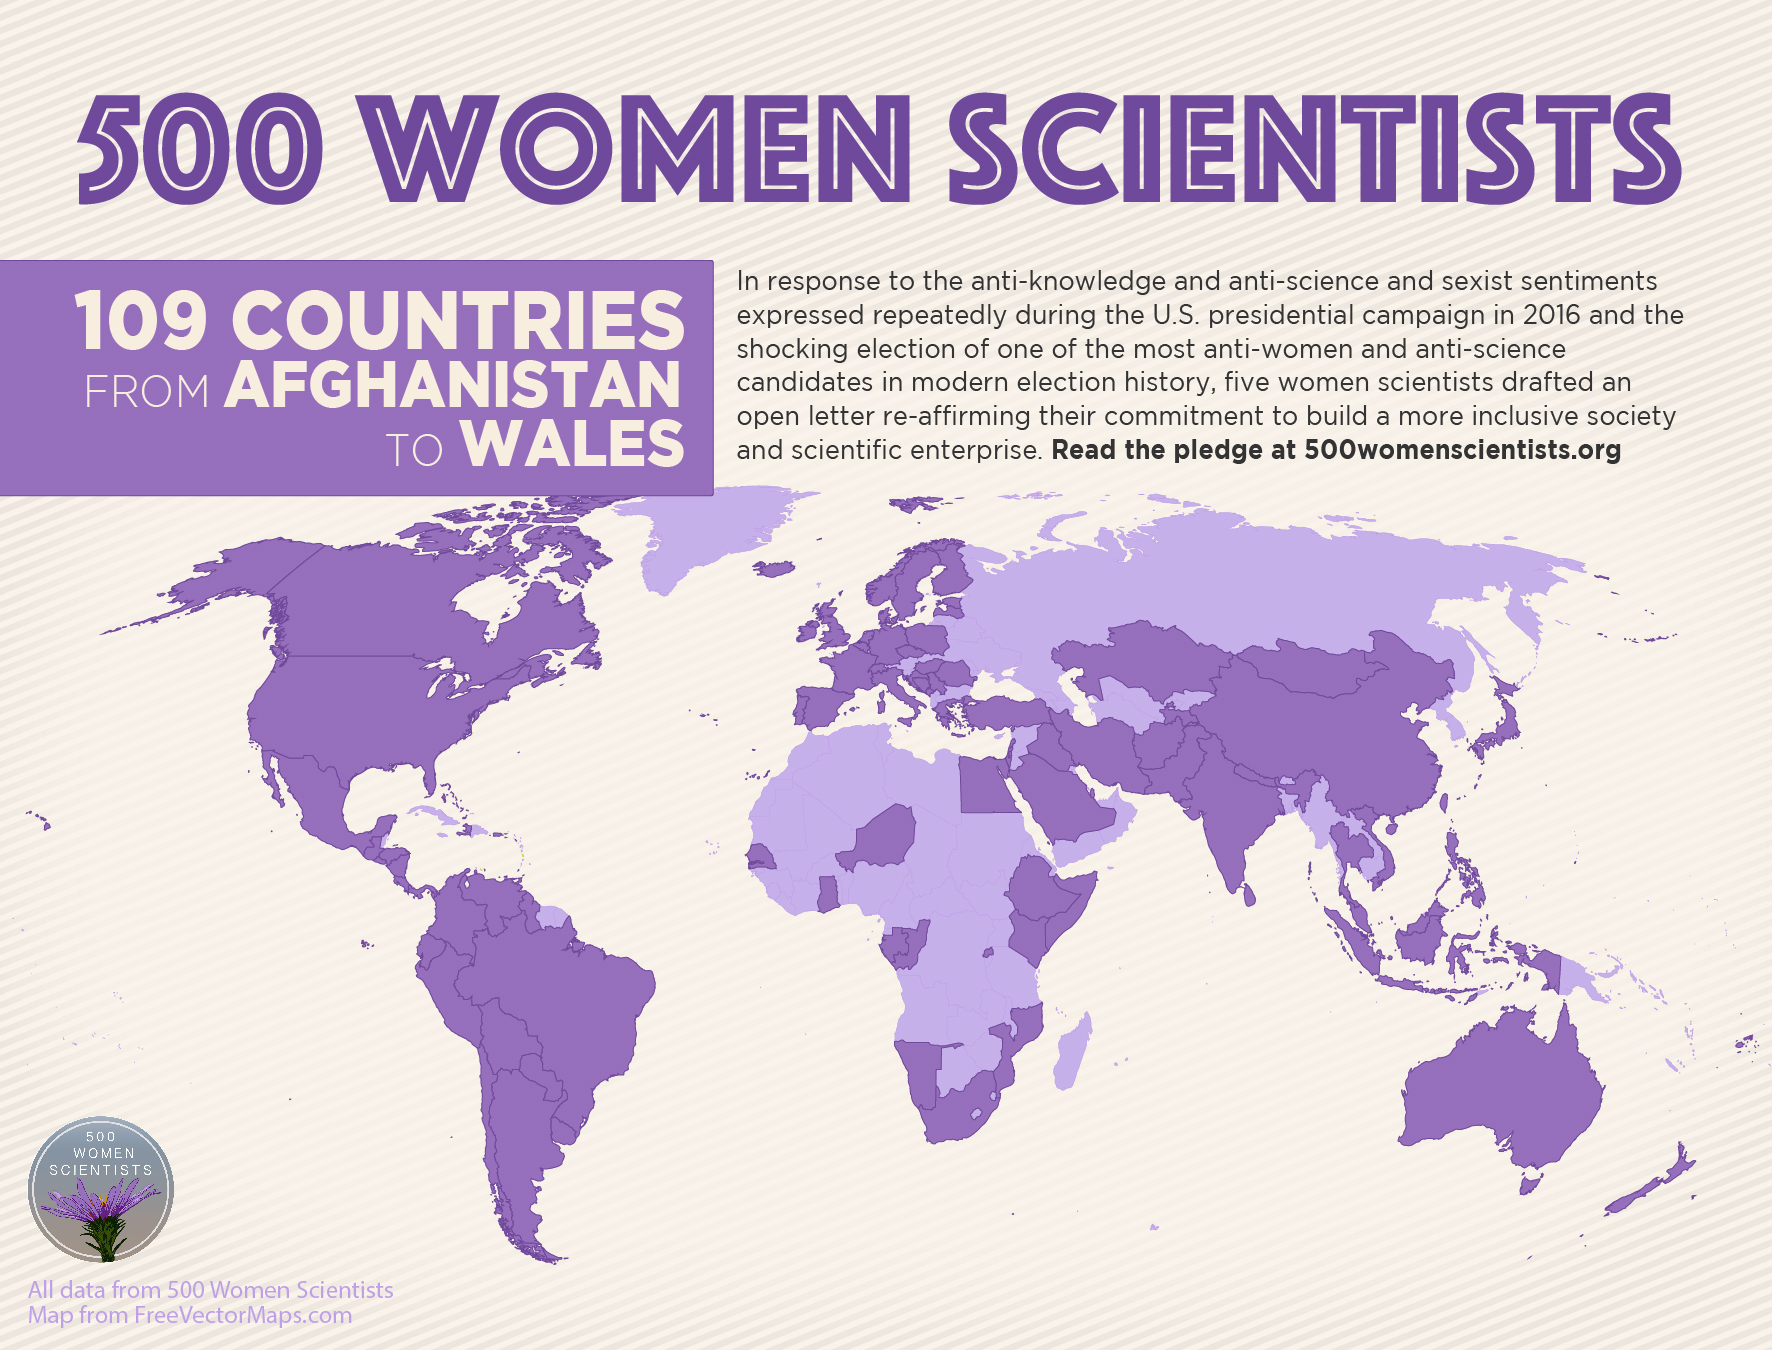 Brittany santangelo big ass Signatories 500 Women Scientists